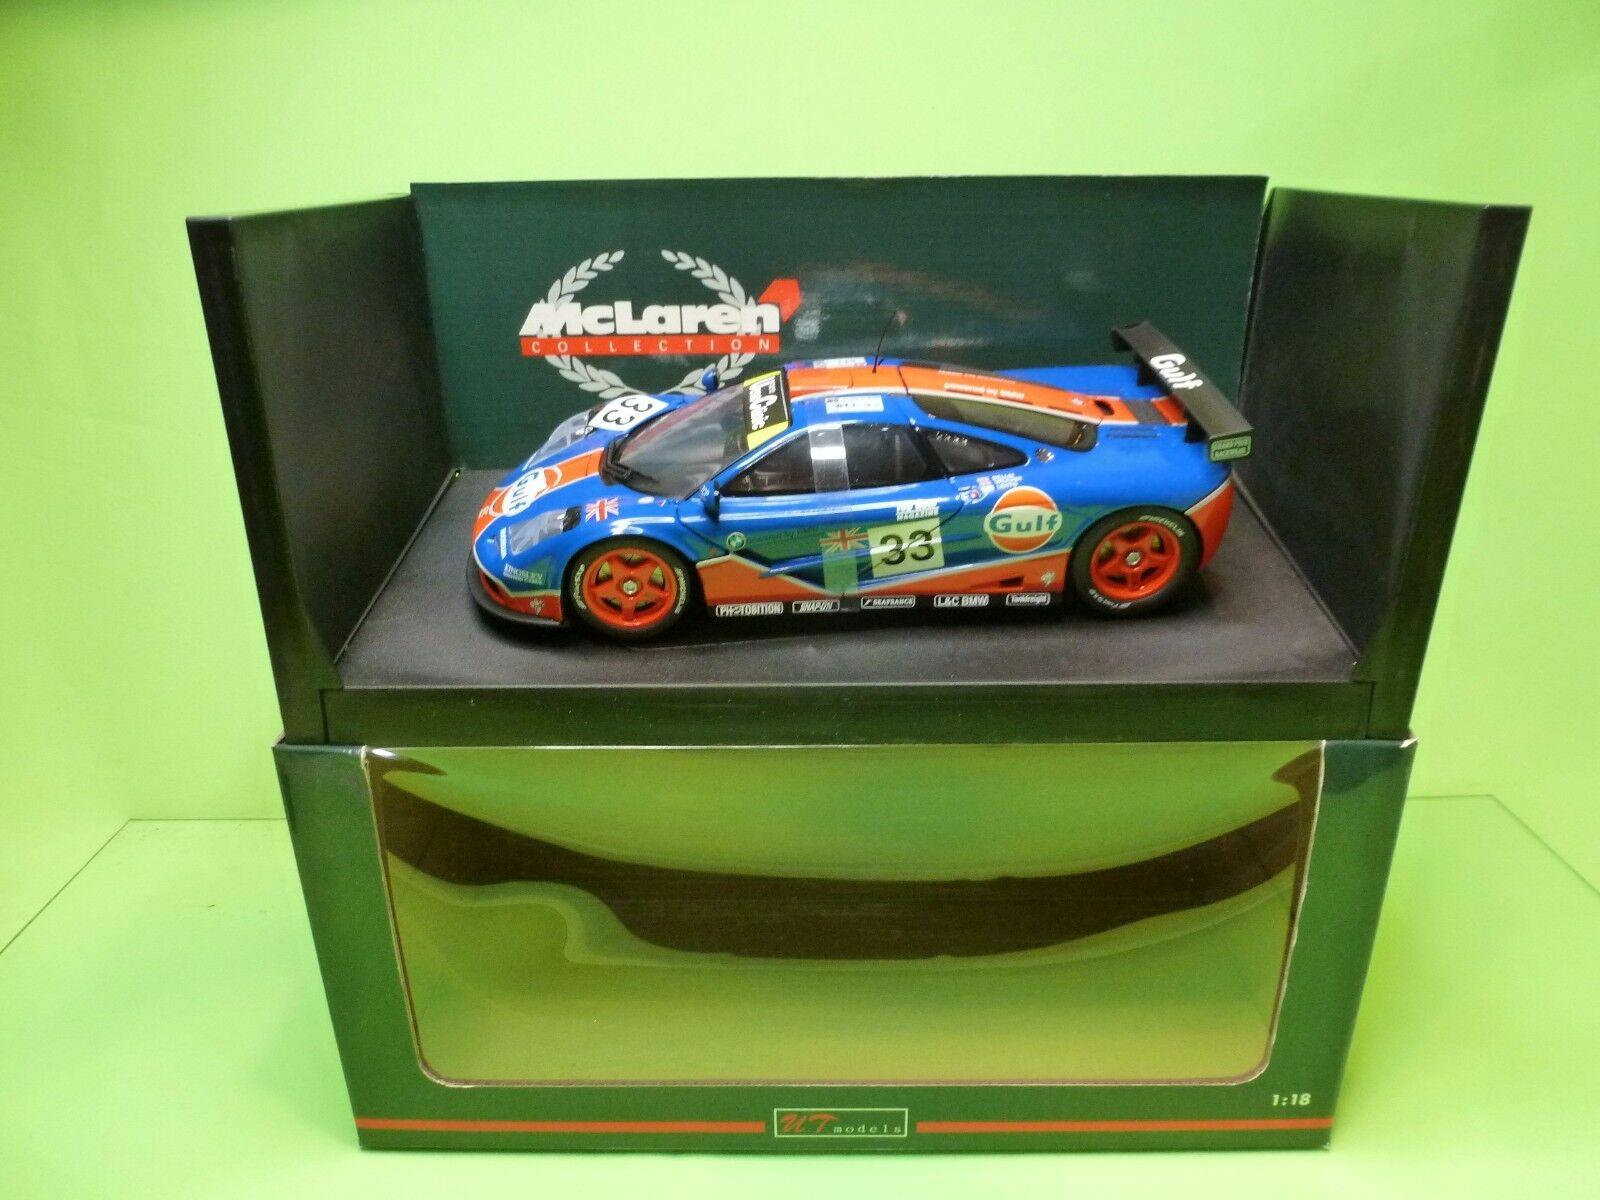 UT MODELS McLAREN F1 GTR BMW - LE MANS 1996 - GULF Blau 1 18 -  EXCELLENT IN BOX